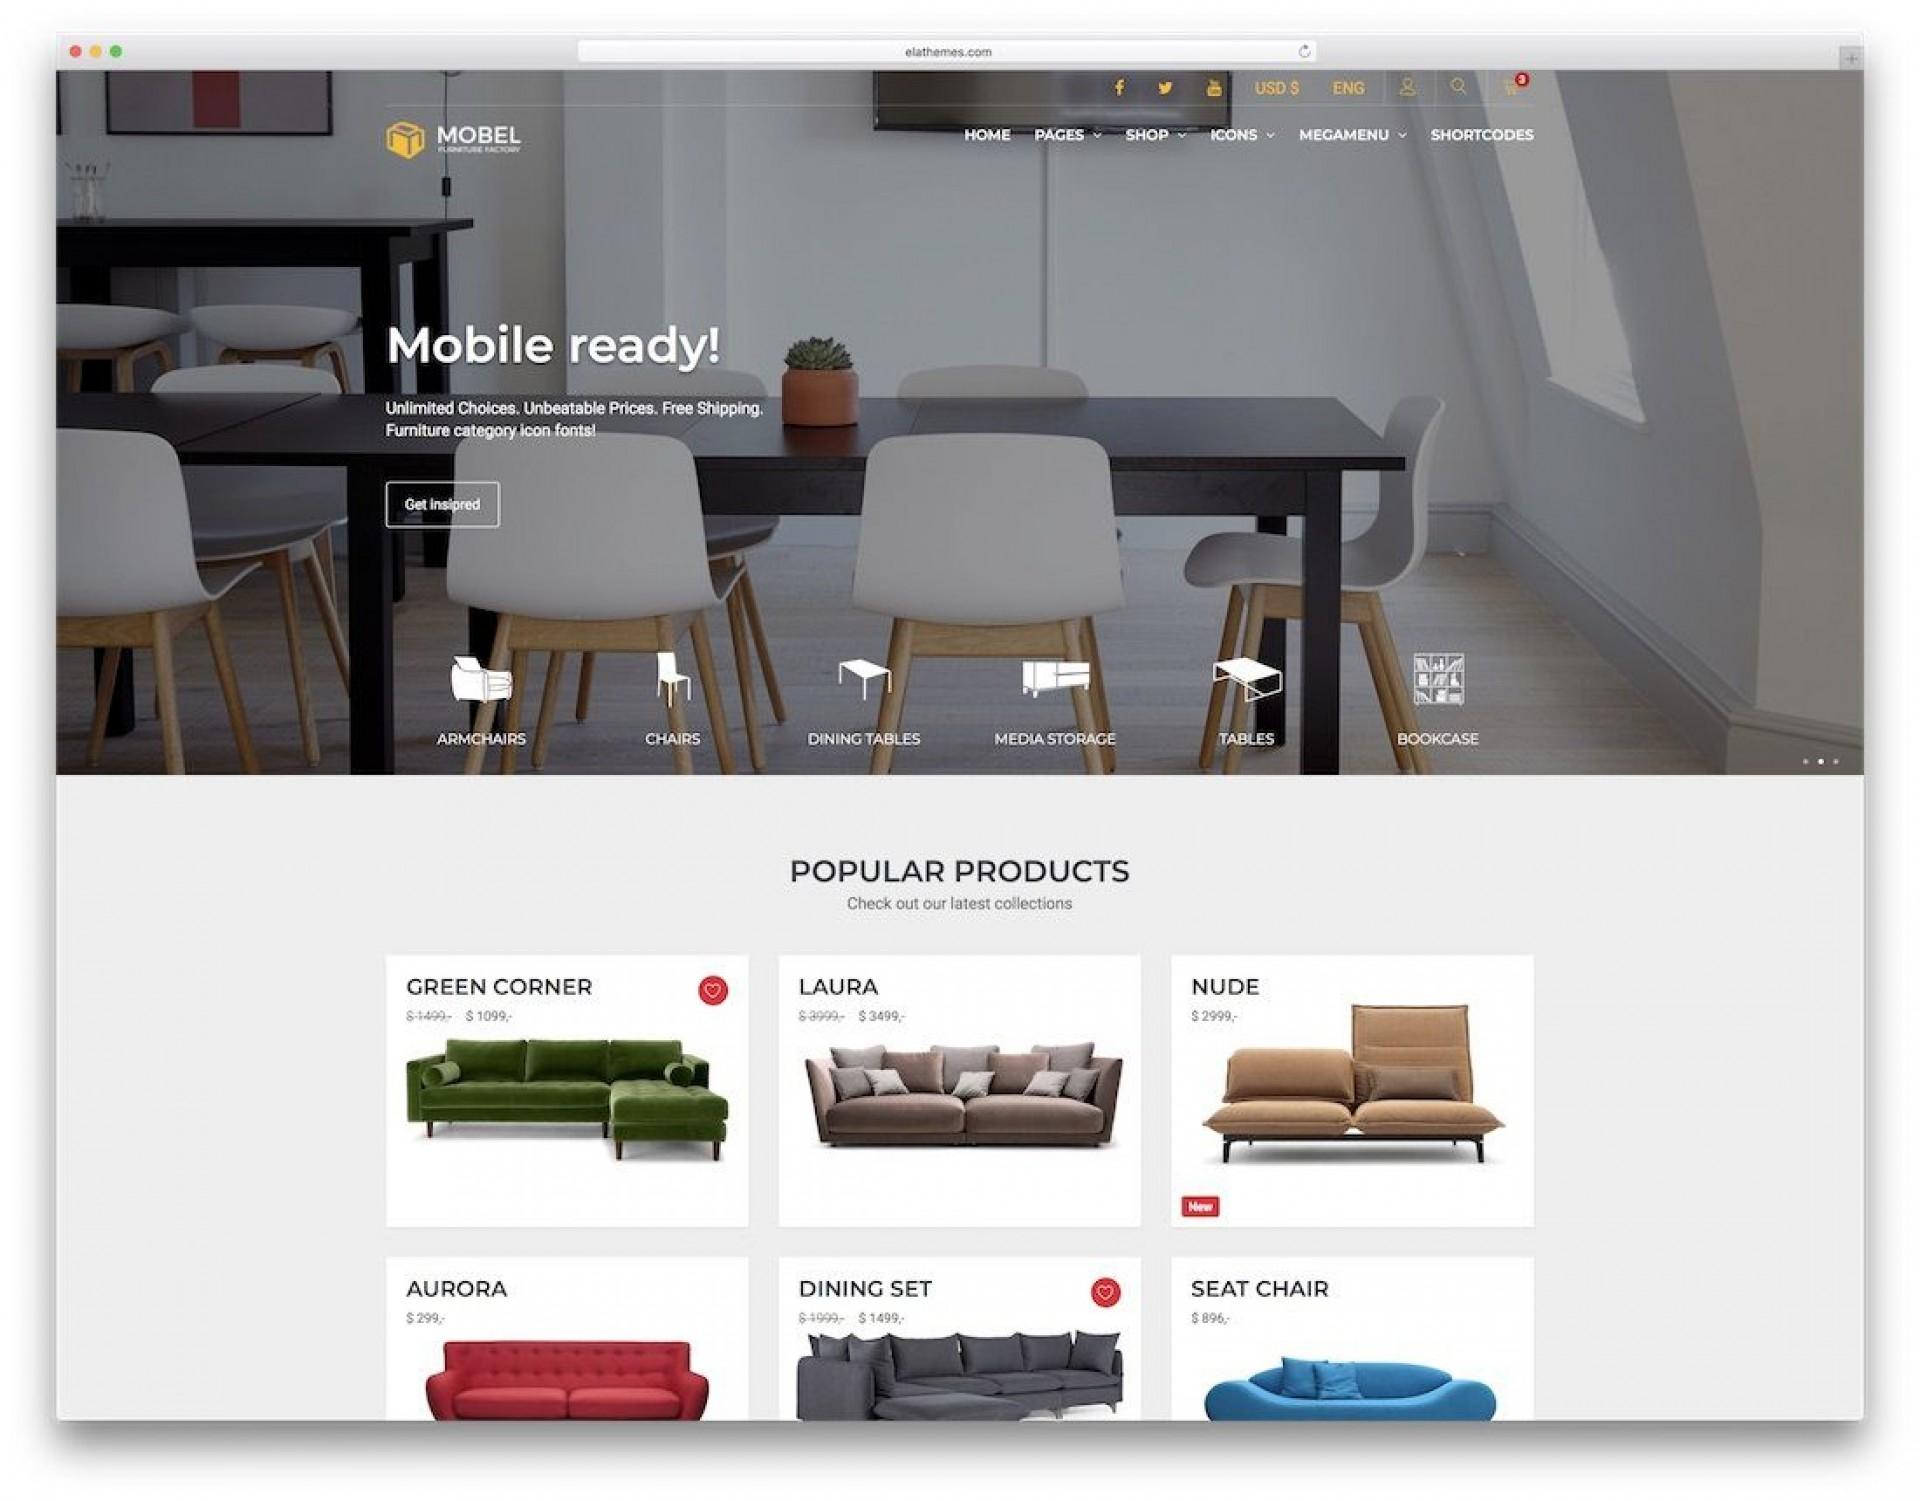 006 Wonderful Interior Design Html Template Free Highest Clarity  Download1920